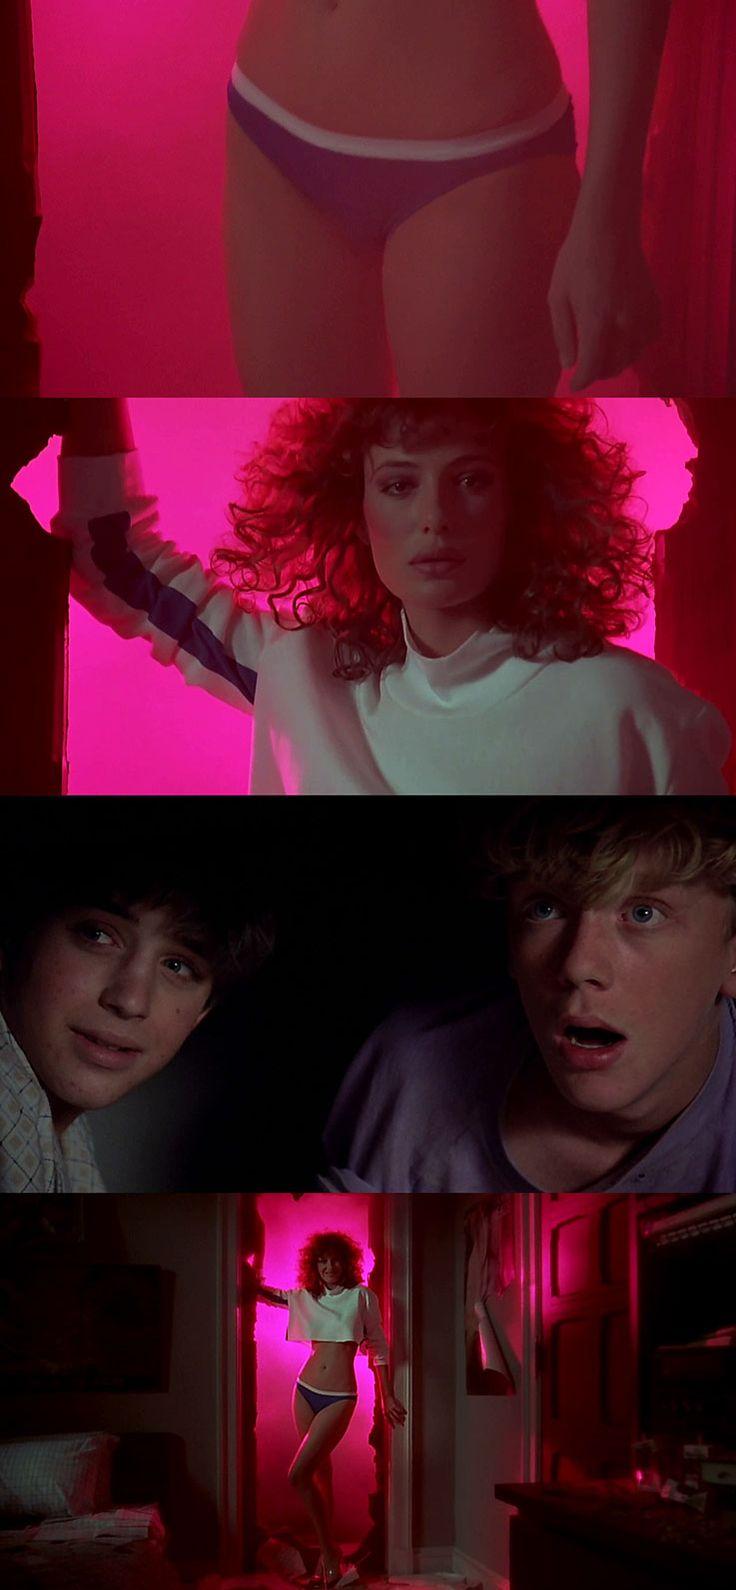 Weird Science – 1985 | The Best 80's Movies | Pinterest